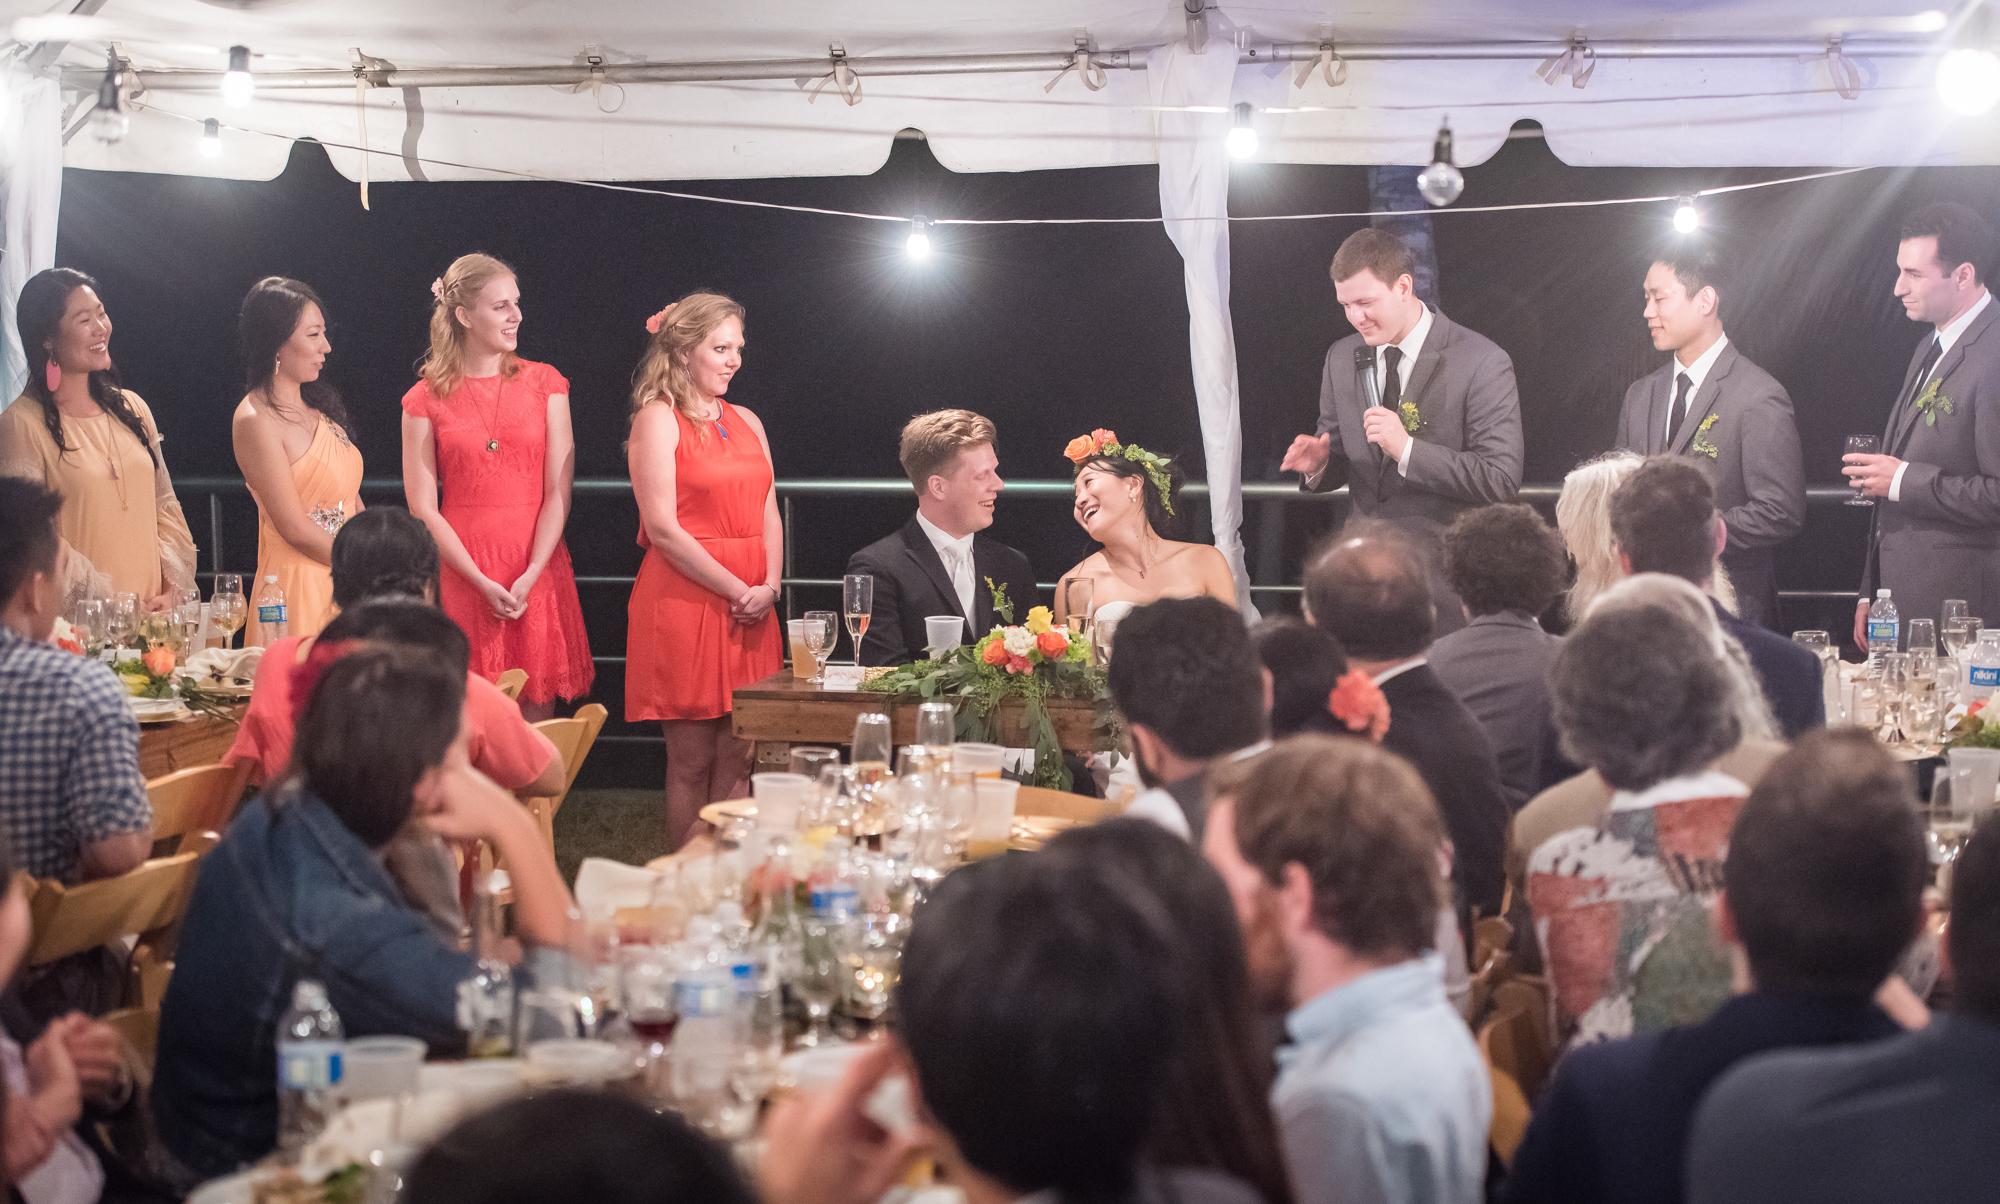 Yifan_Zhang_Geoff_Oberhofer_Carlin_Ma_wedding-1452.jpg